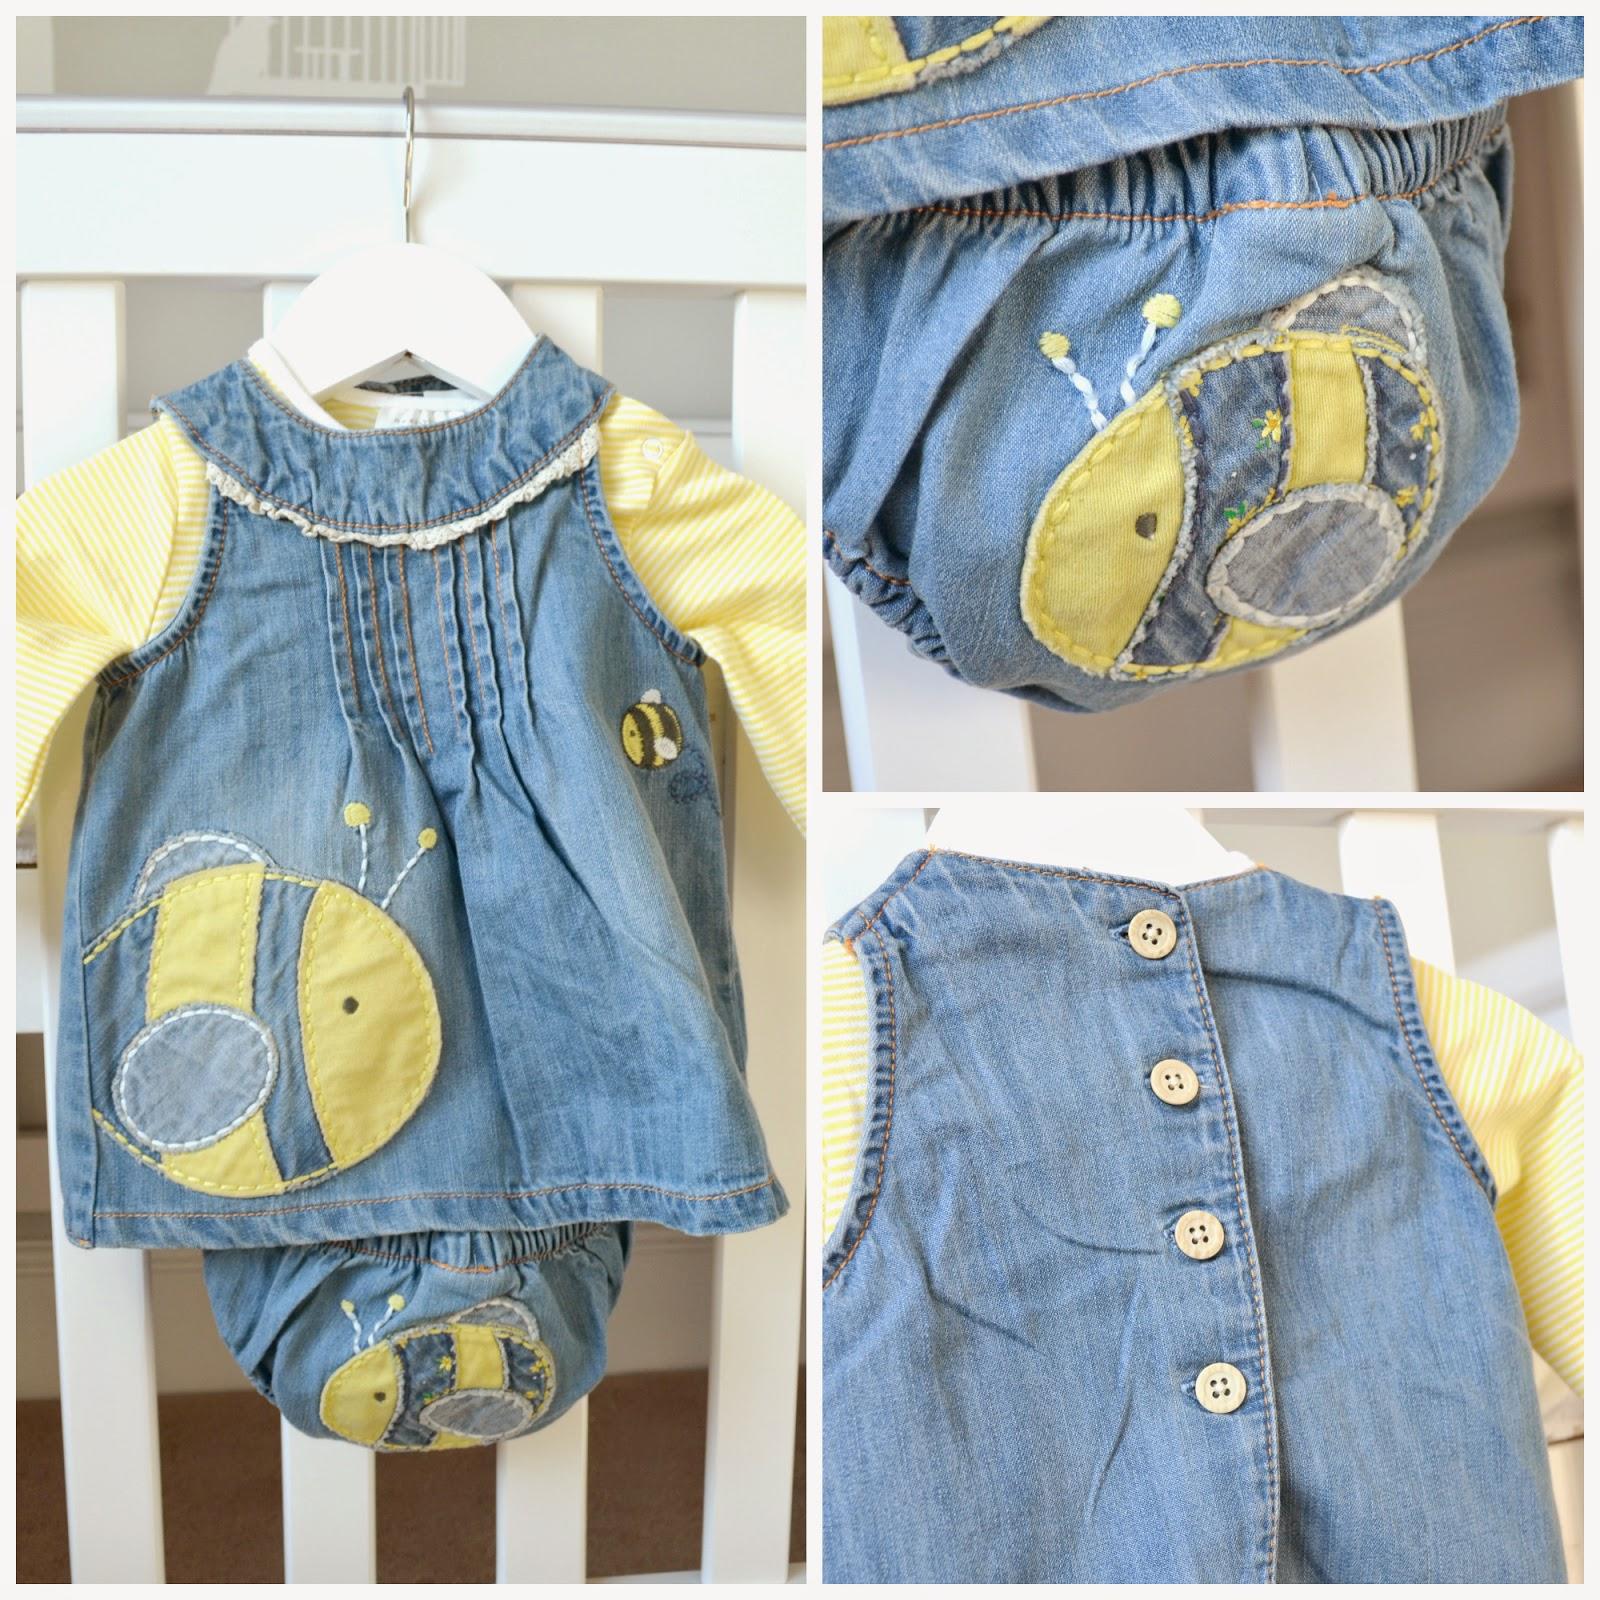 b77701126a6d Next Baby Girl Clothing